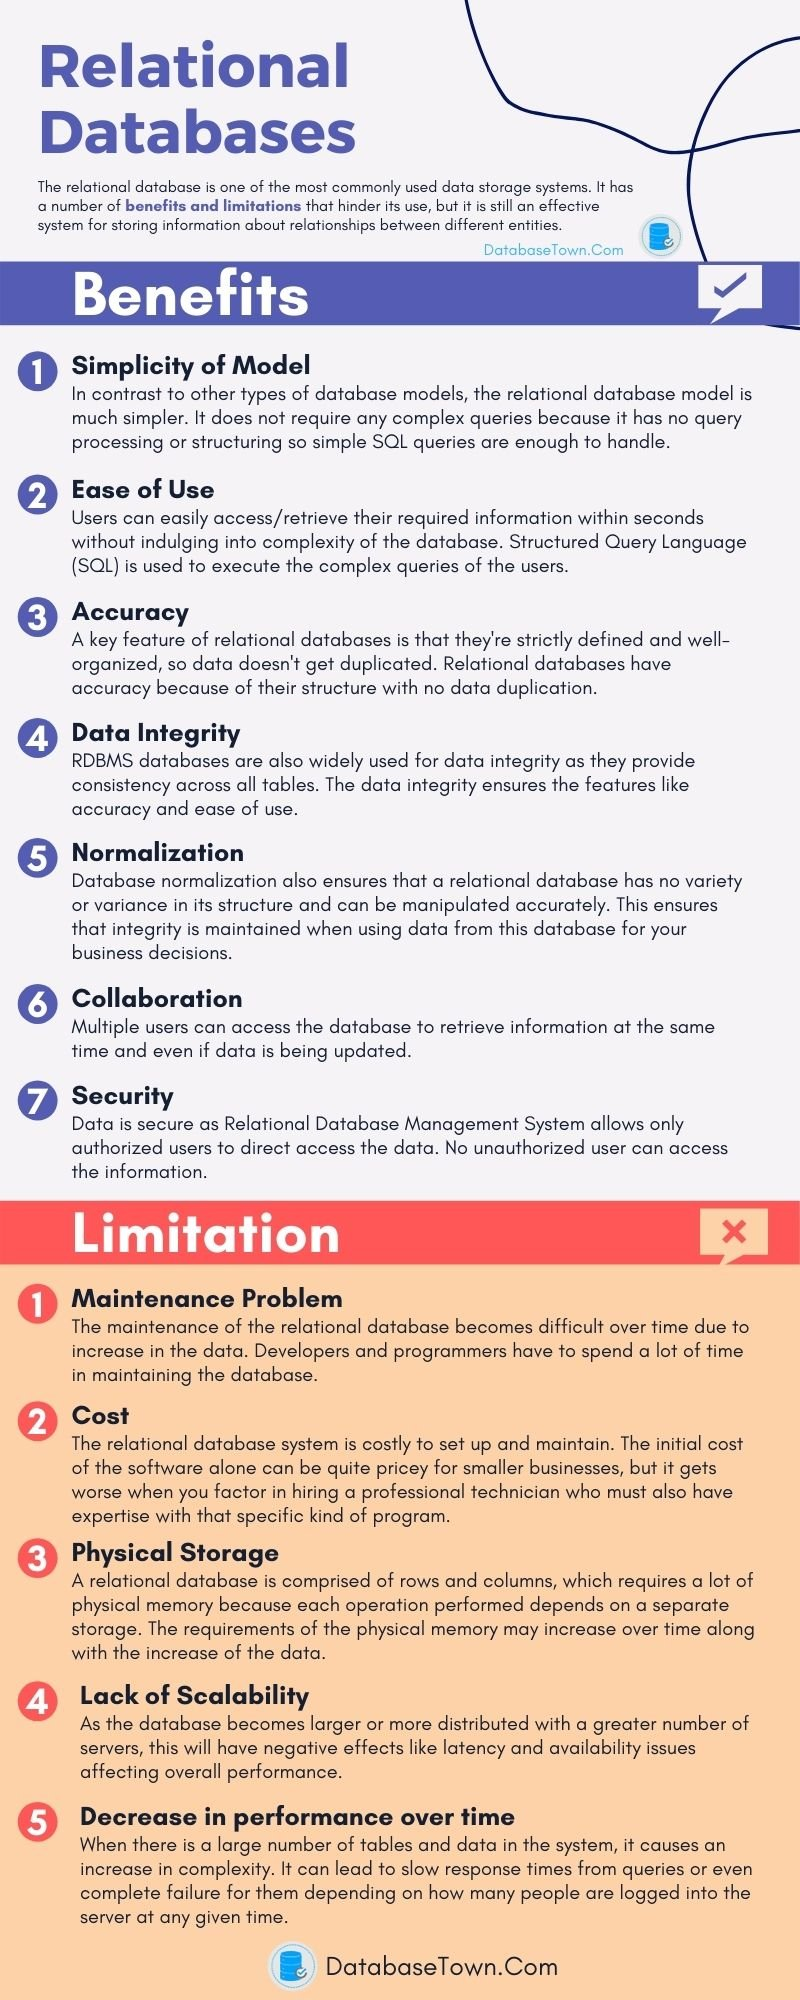 Relational Database Benefits and Limitations (Advantages & Disadvantages)